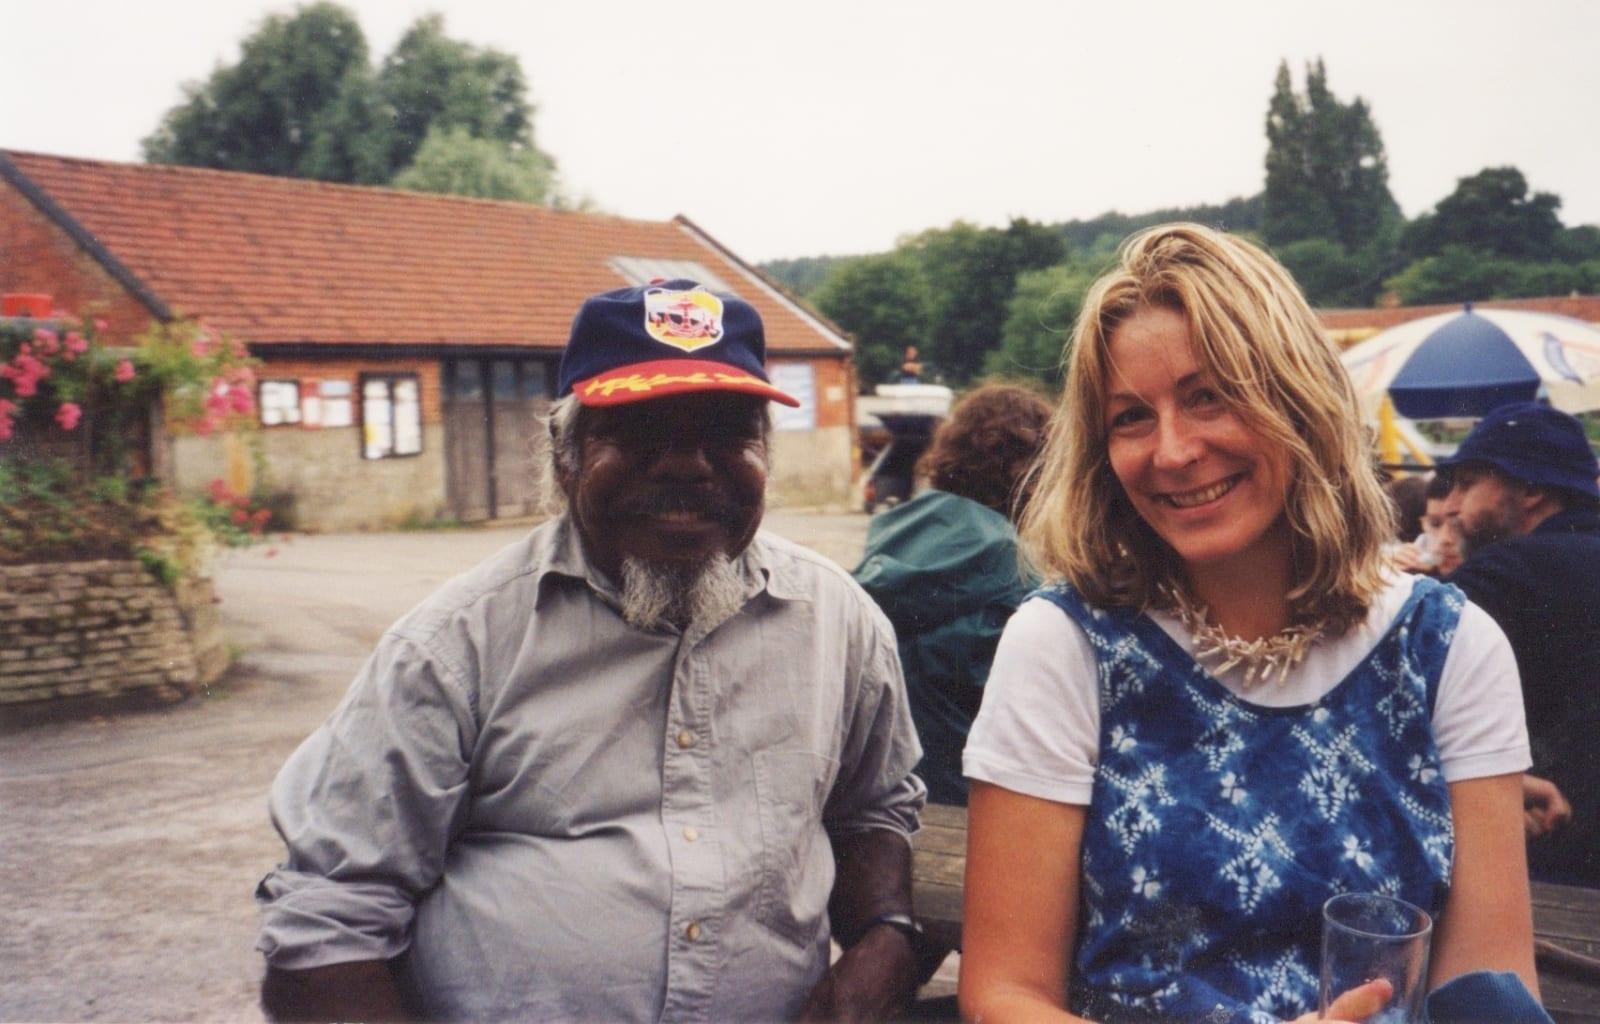 Rebecca Hossack and Jimmy Pike in Suffolk